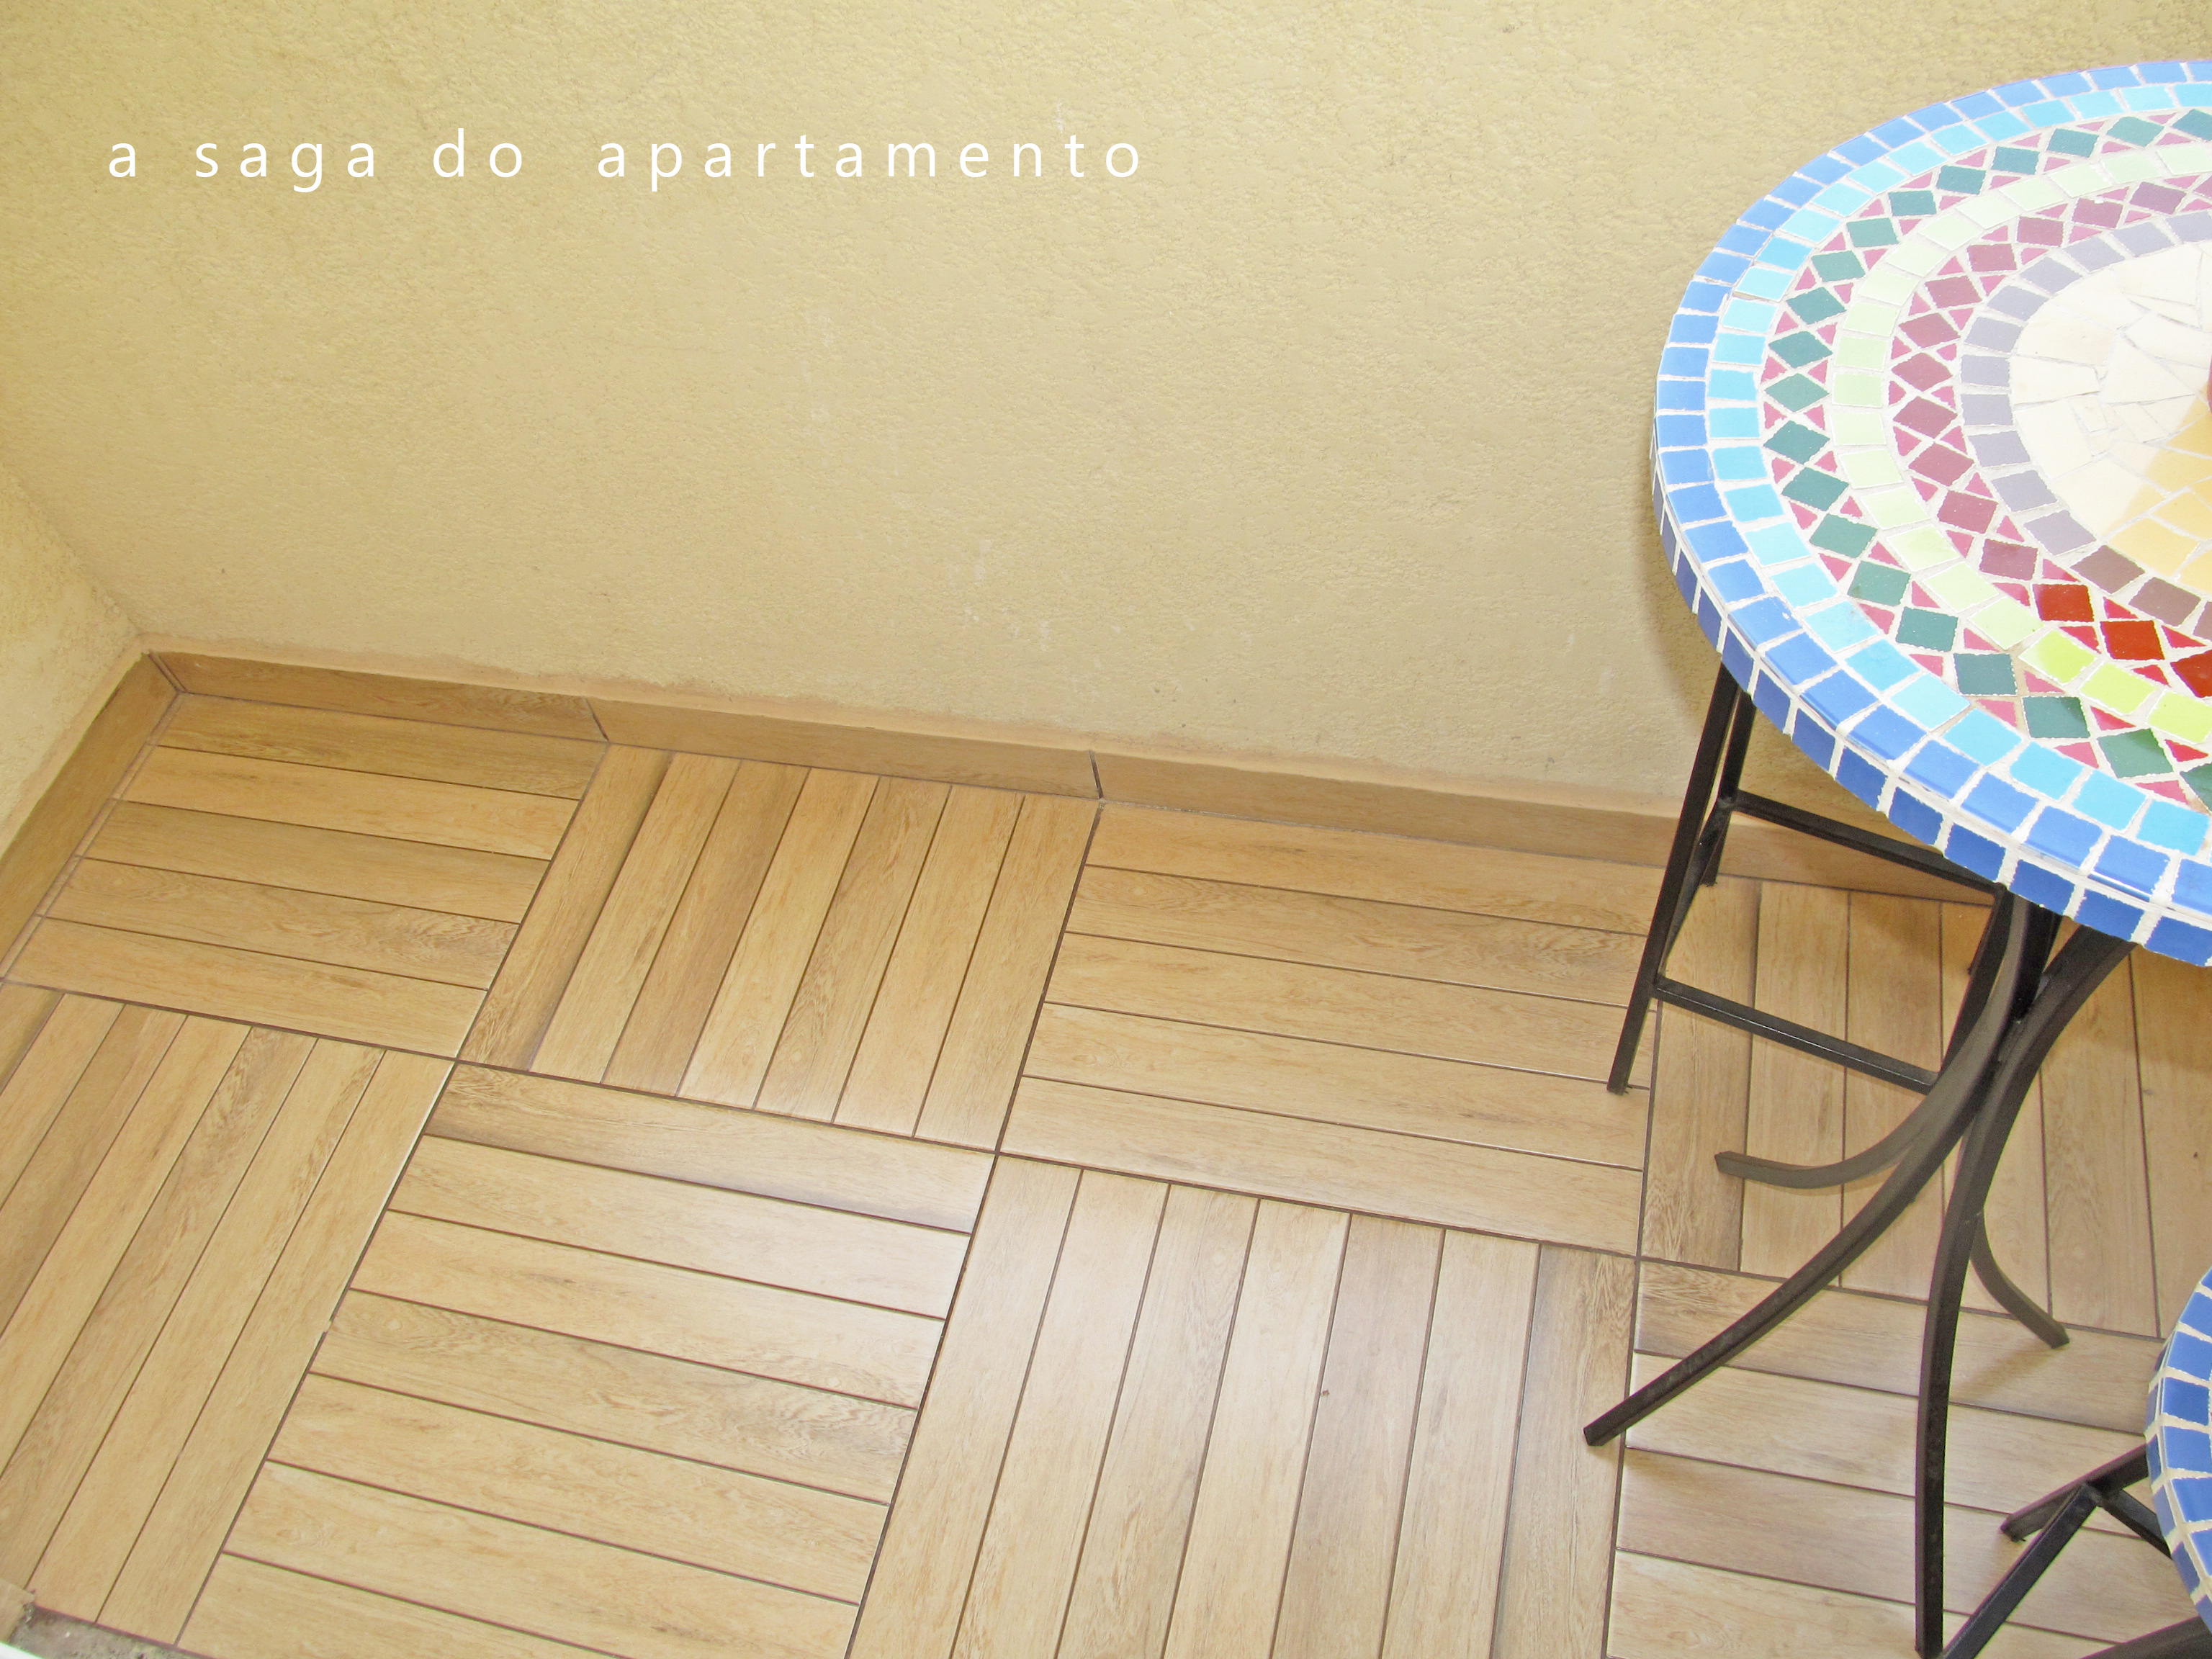 apartamento na planta a saga do apartamento #2577A6 3072 2304